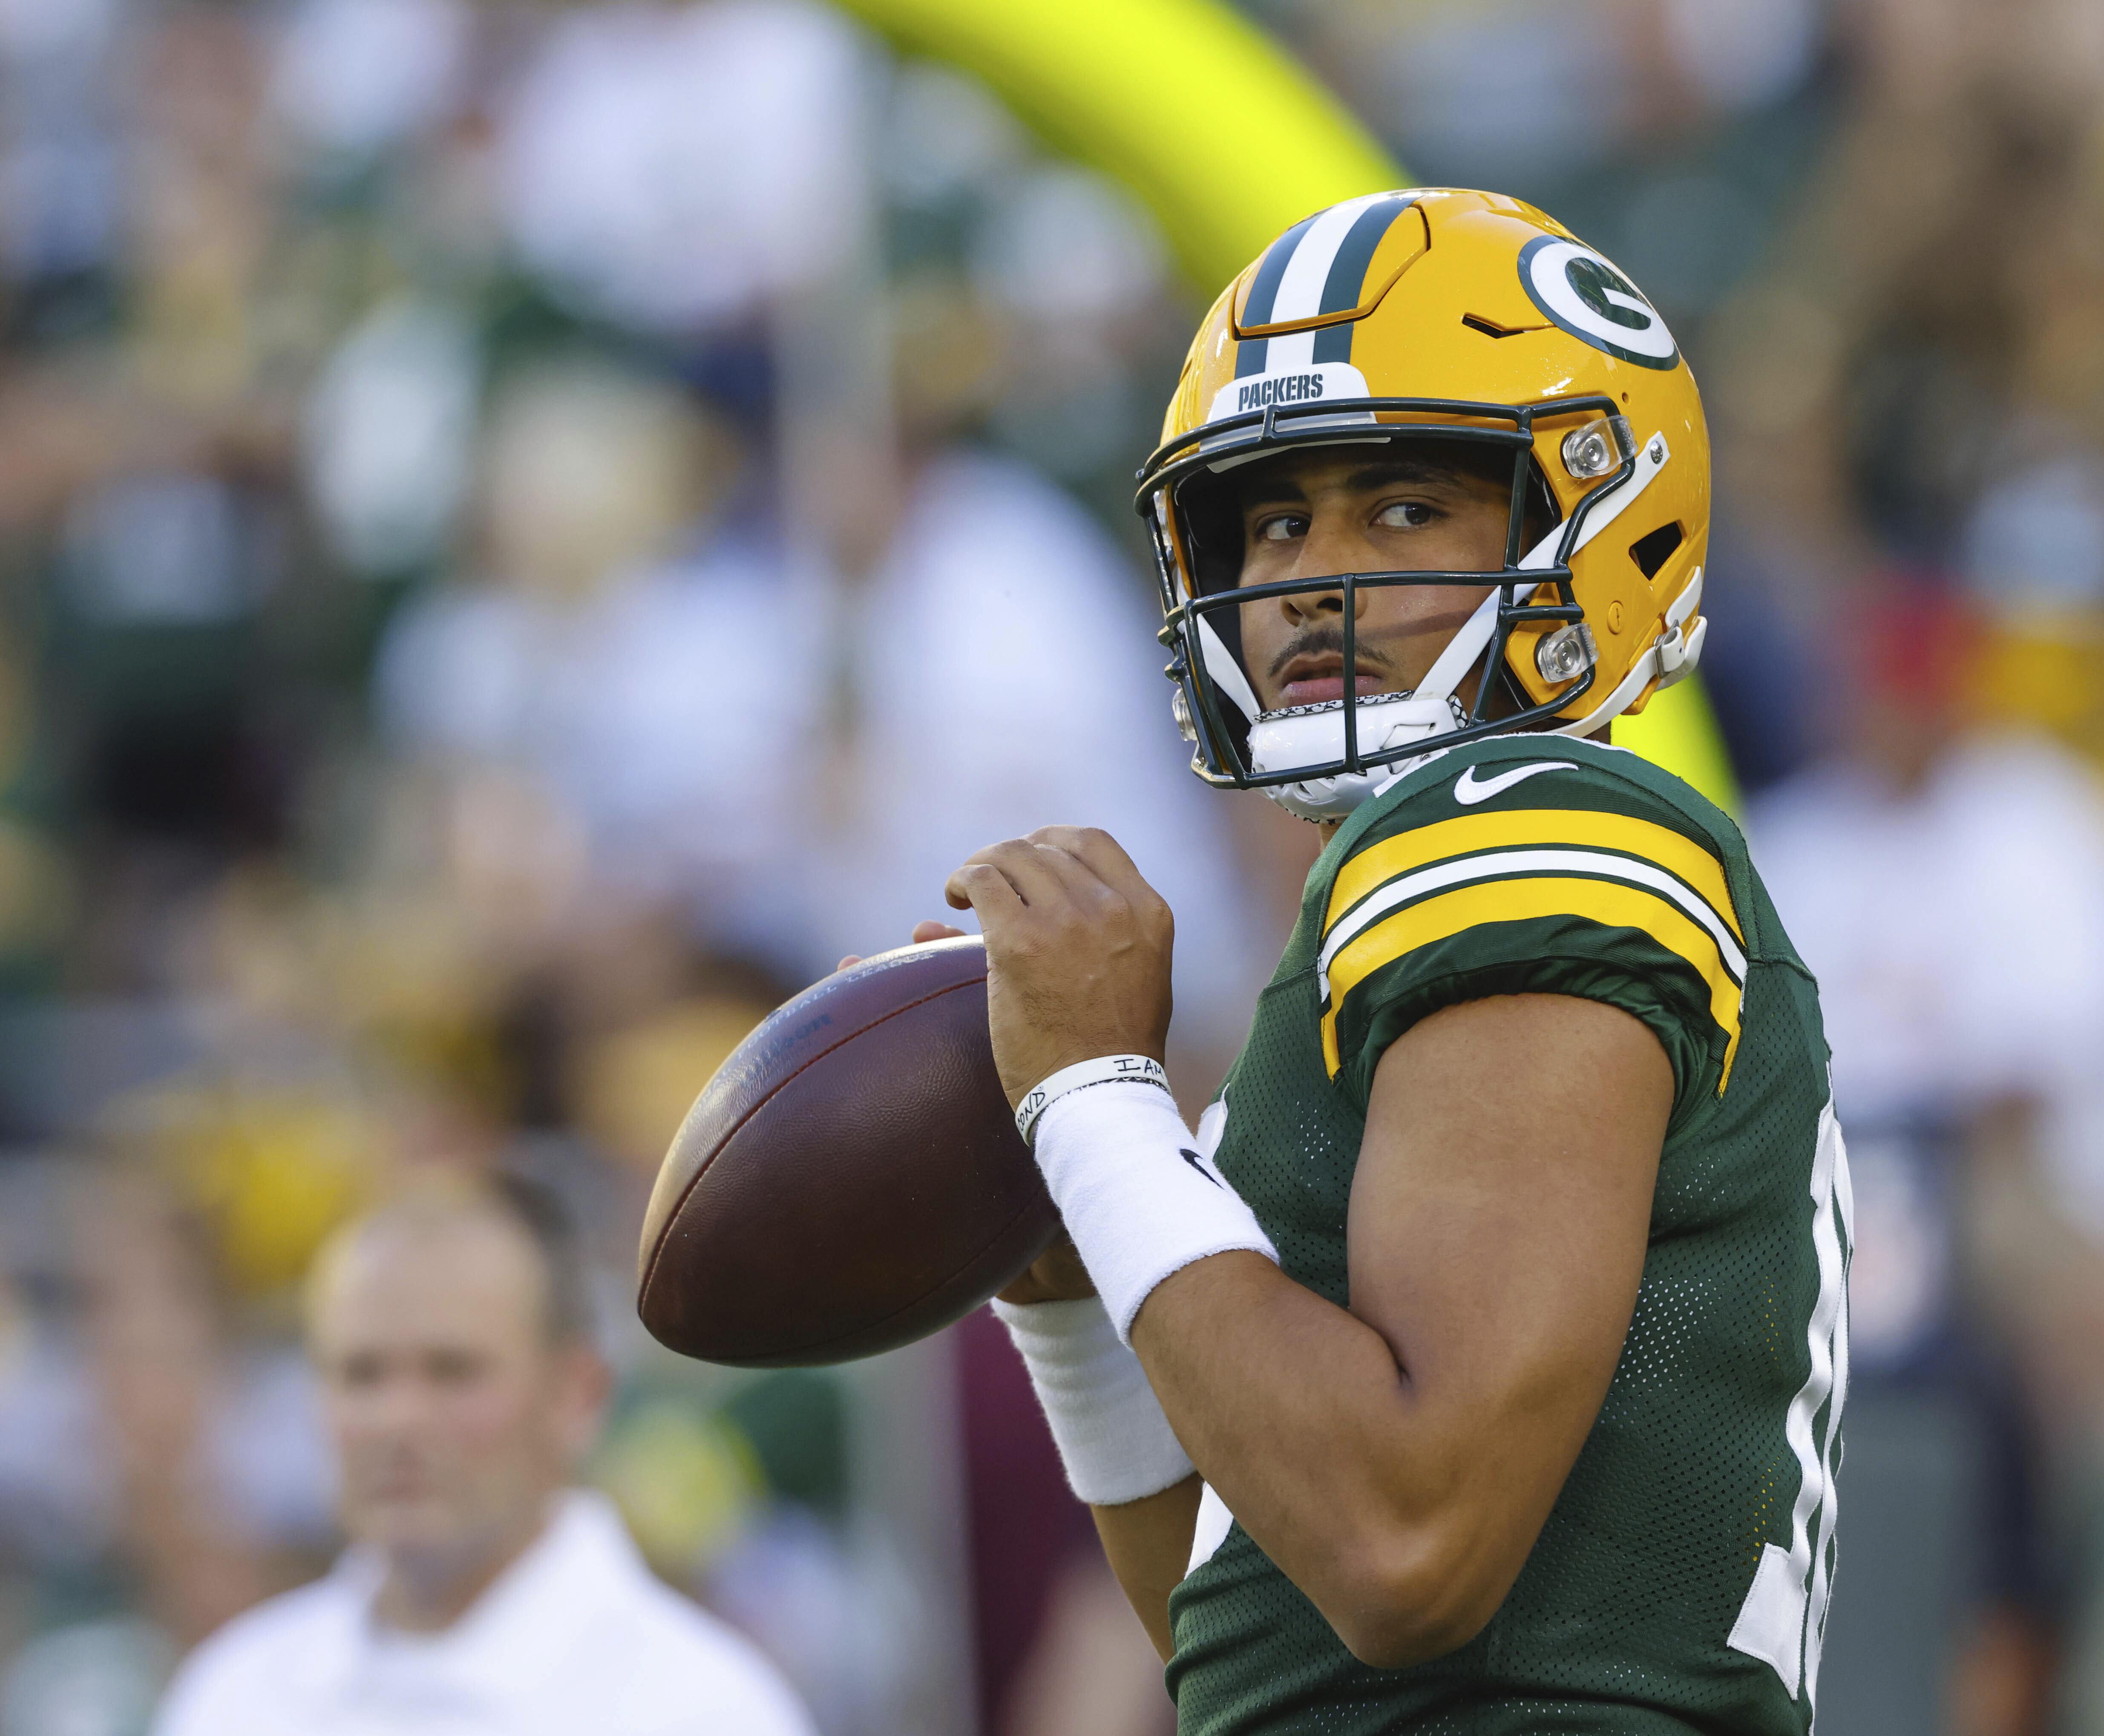 Green Bay Packers quarterback Jordan Love (10) during practice before the Packers' preseason game against the Houston Texans.